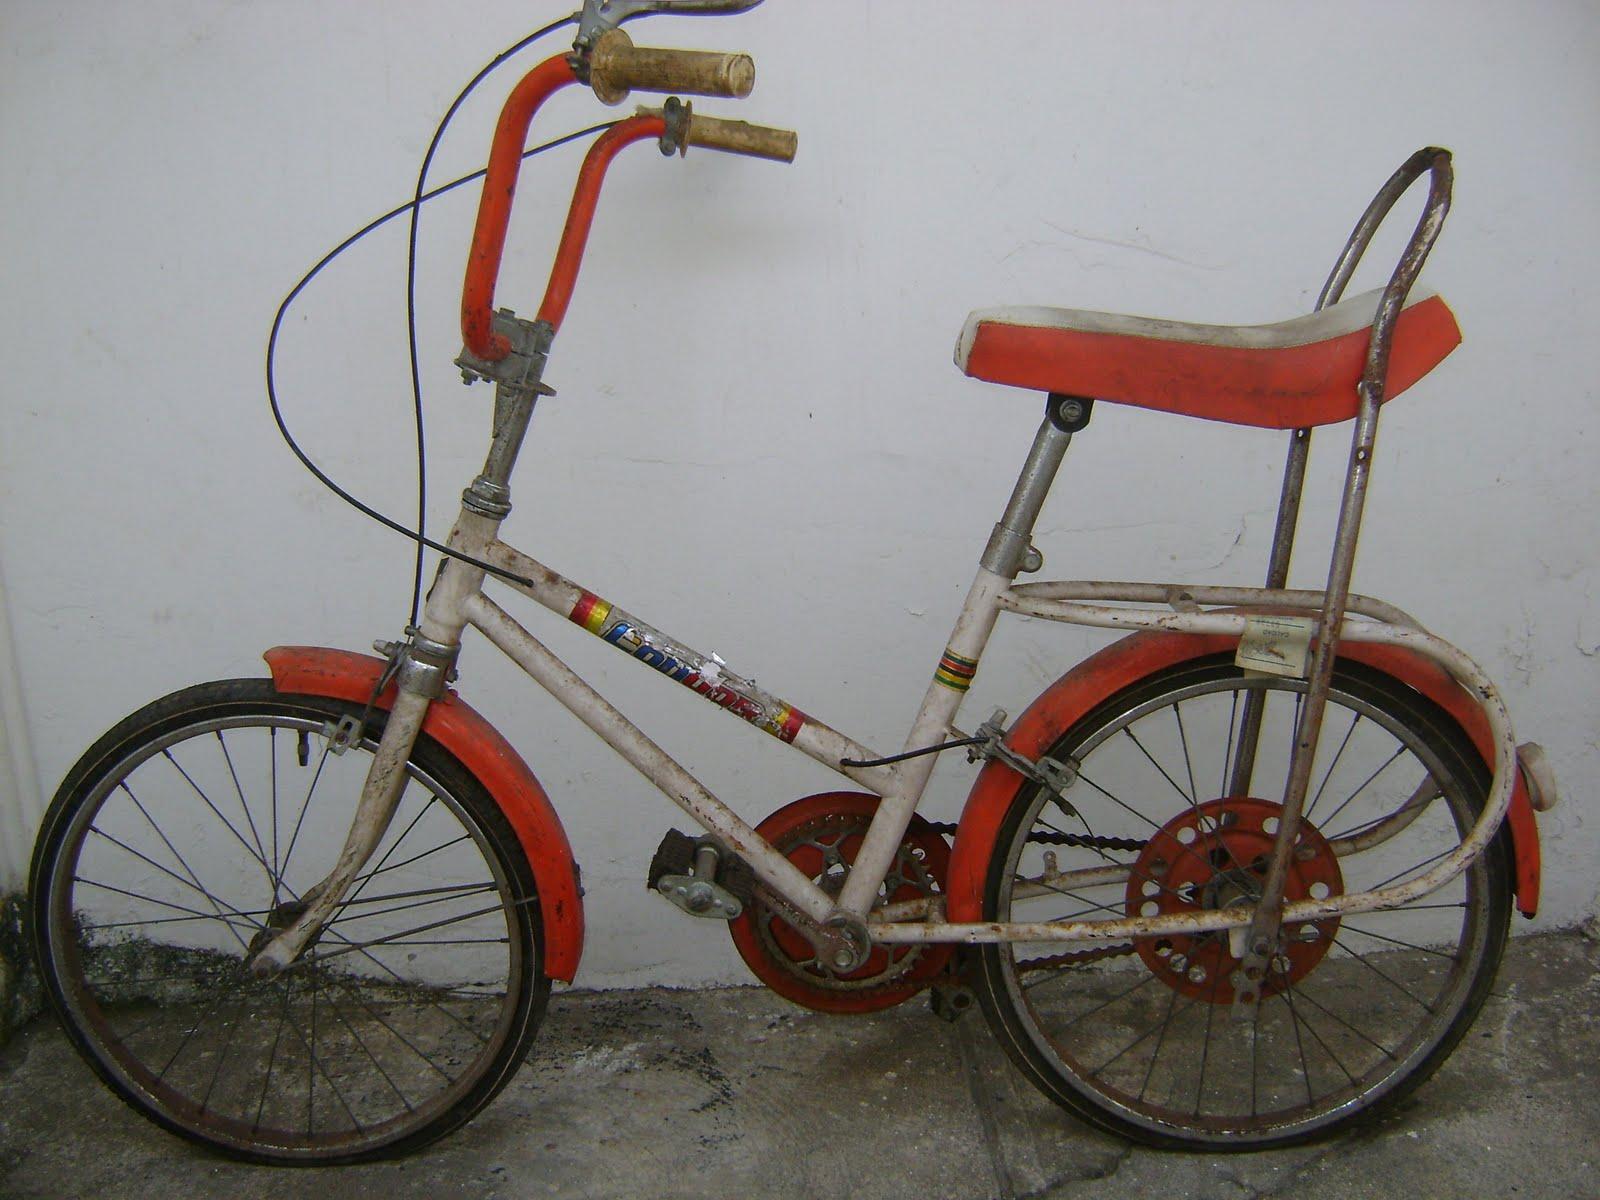 Ni Bicicleta Ni Bicicleto: Retropedal: Mayo 2010